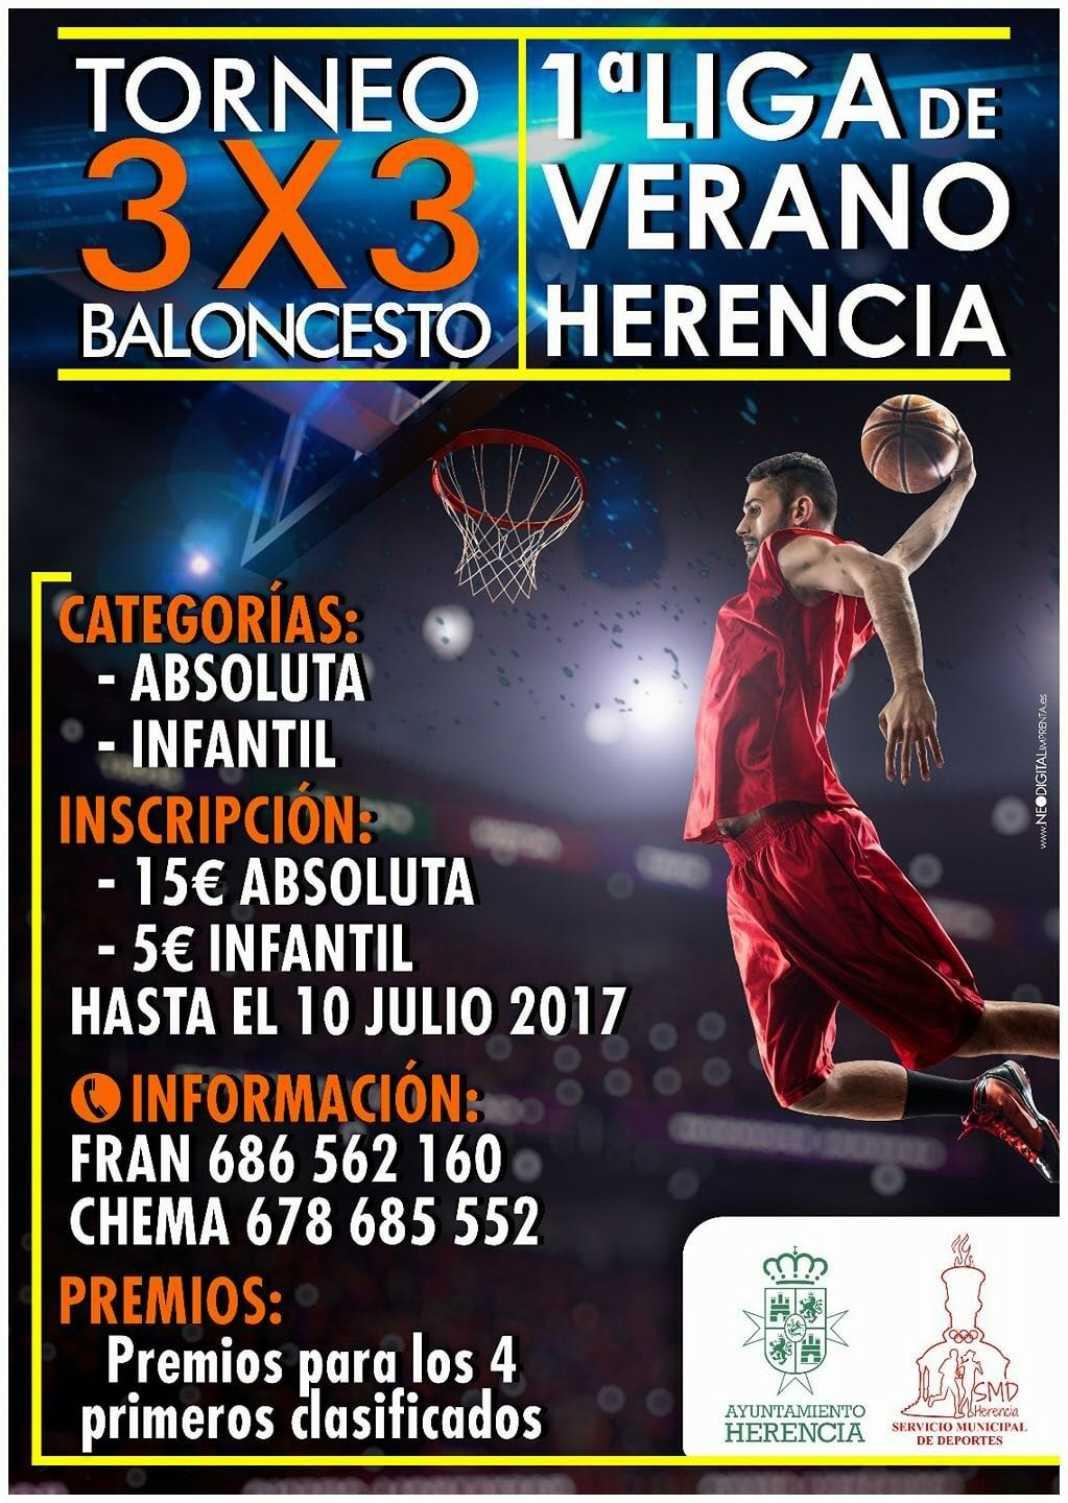 Torneo 3×3 de Baloncesto de Verano 2017 1